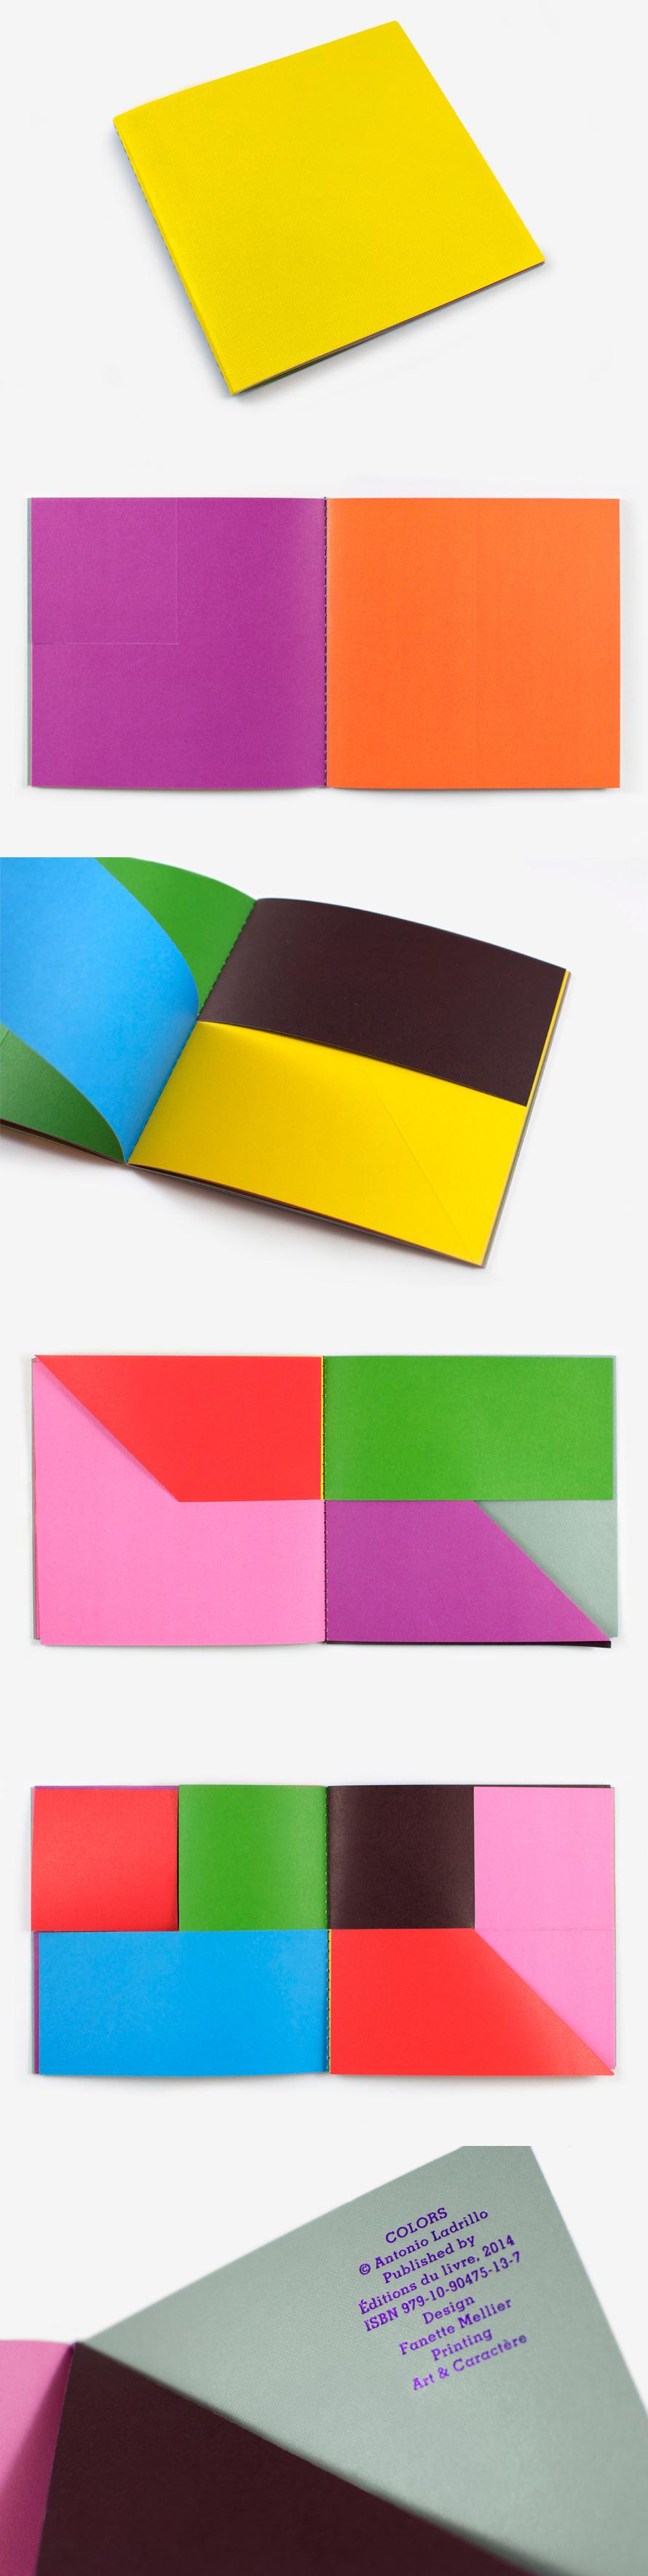 Dots, lines, colors {books} by Antonio Ladrillo